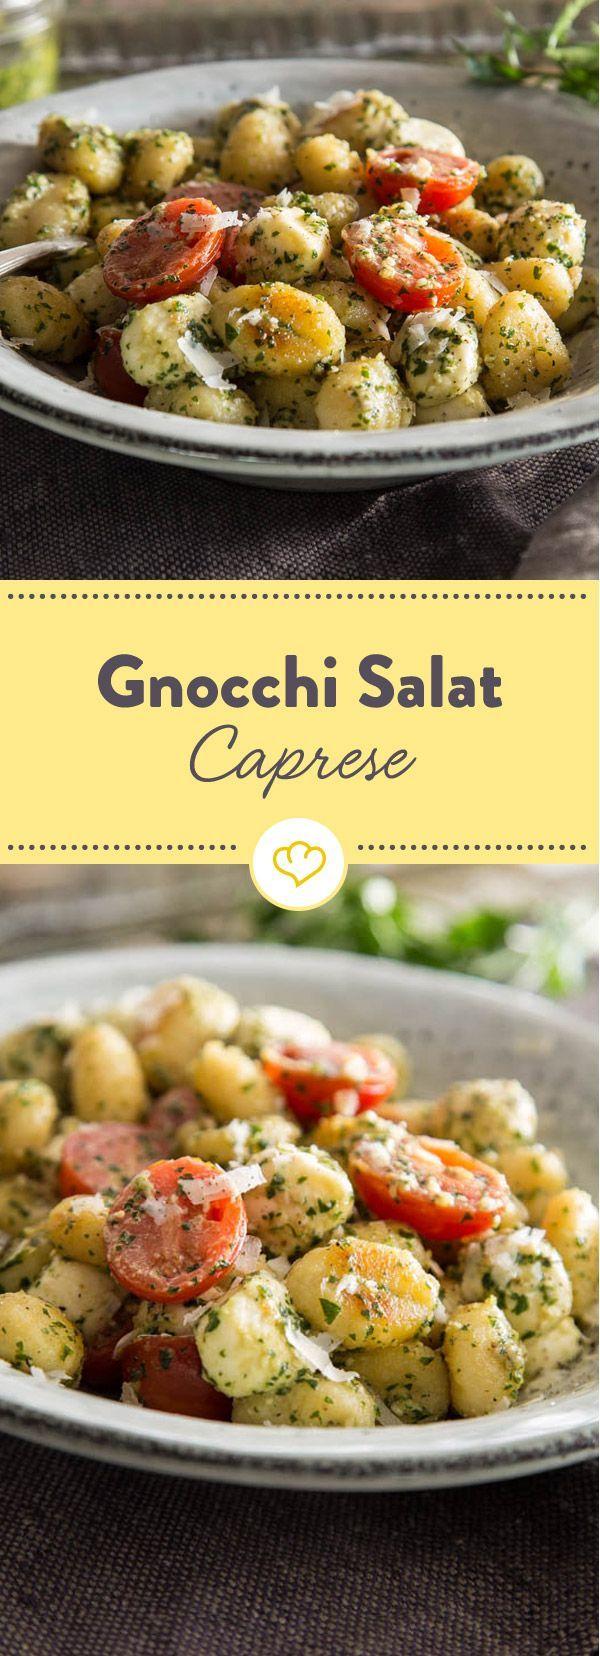 Italien in der Schüssel: Gnocchi-Pesto-Salat Caprese – Sandra A.